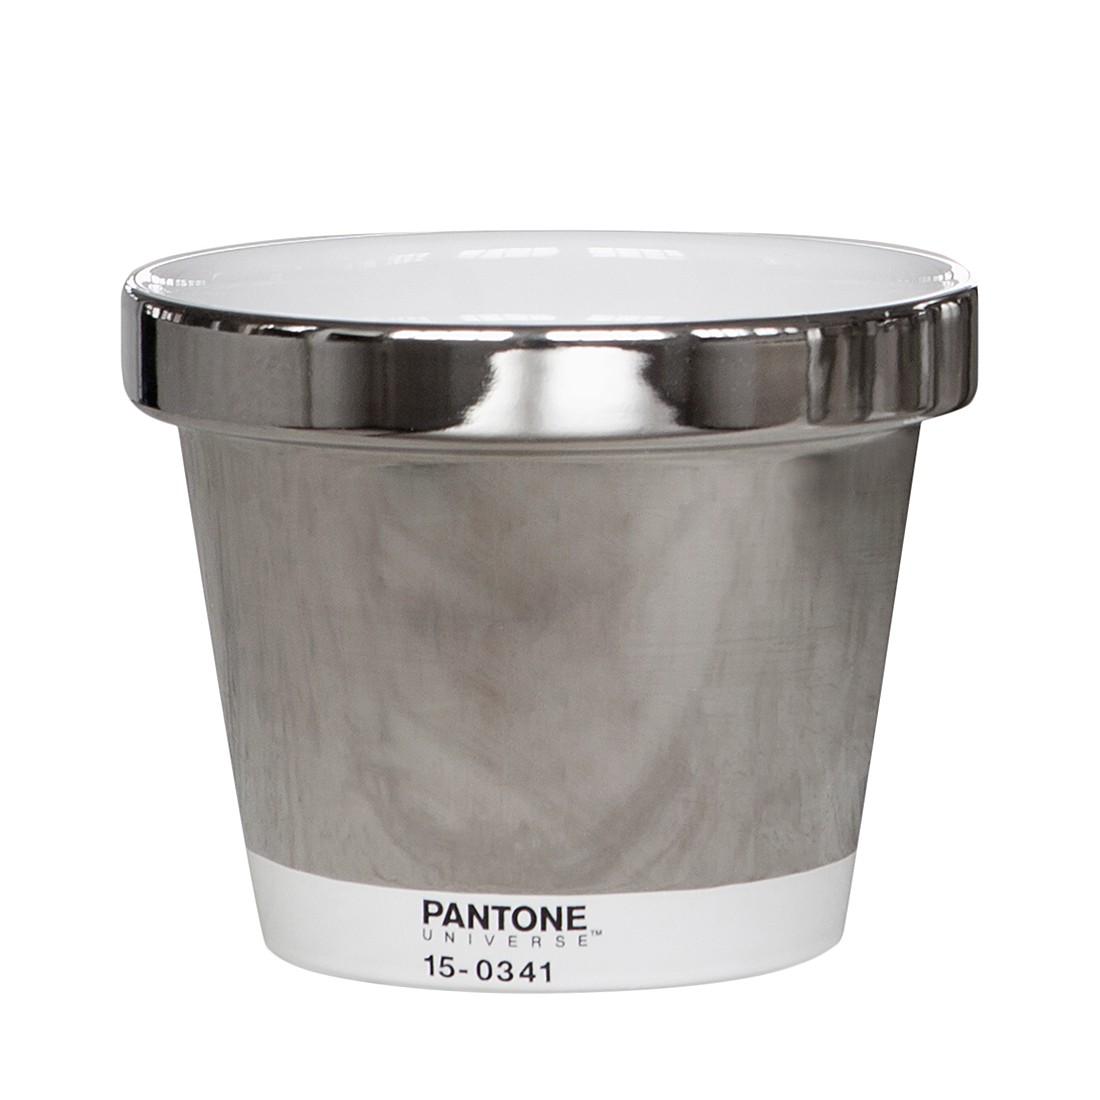 Blumentopf Pantone I – Silber, Pantone günstig bestellen